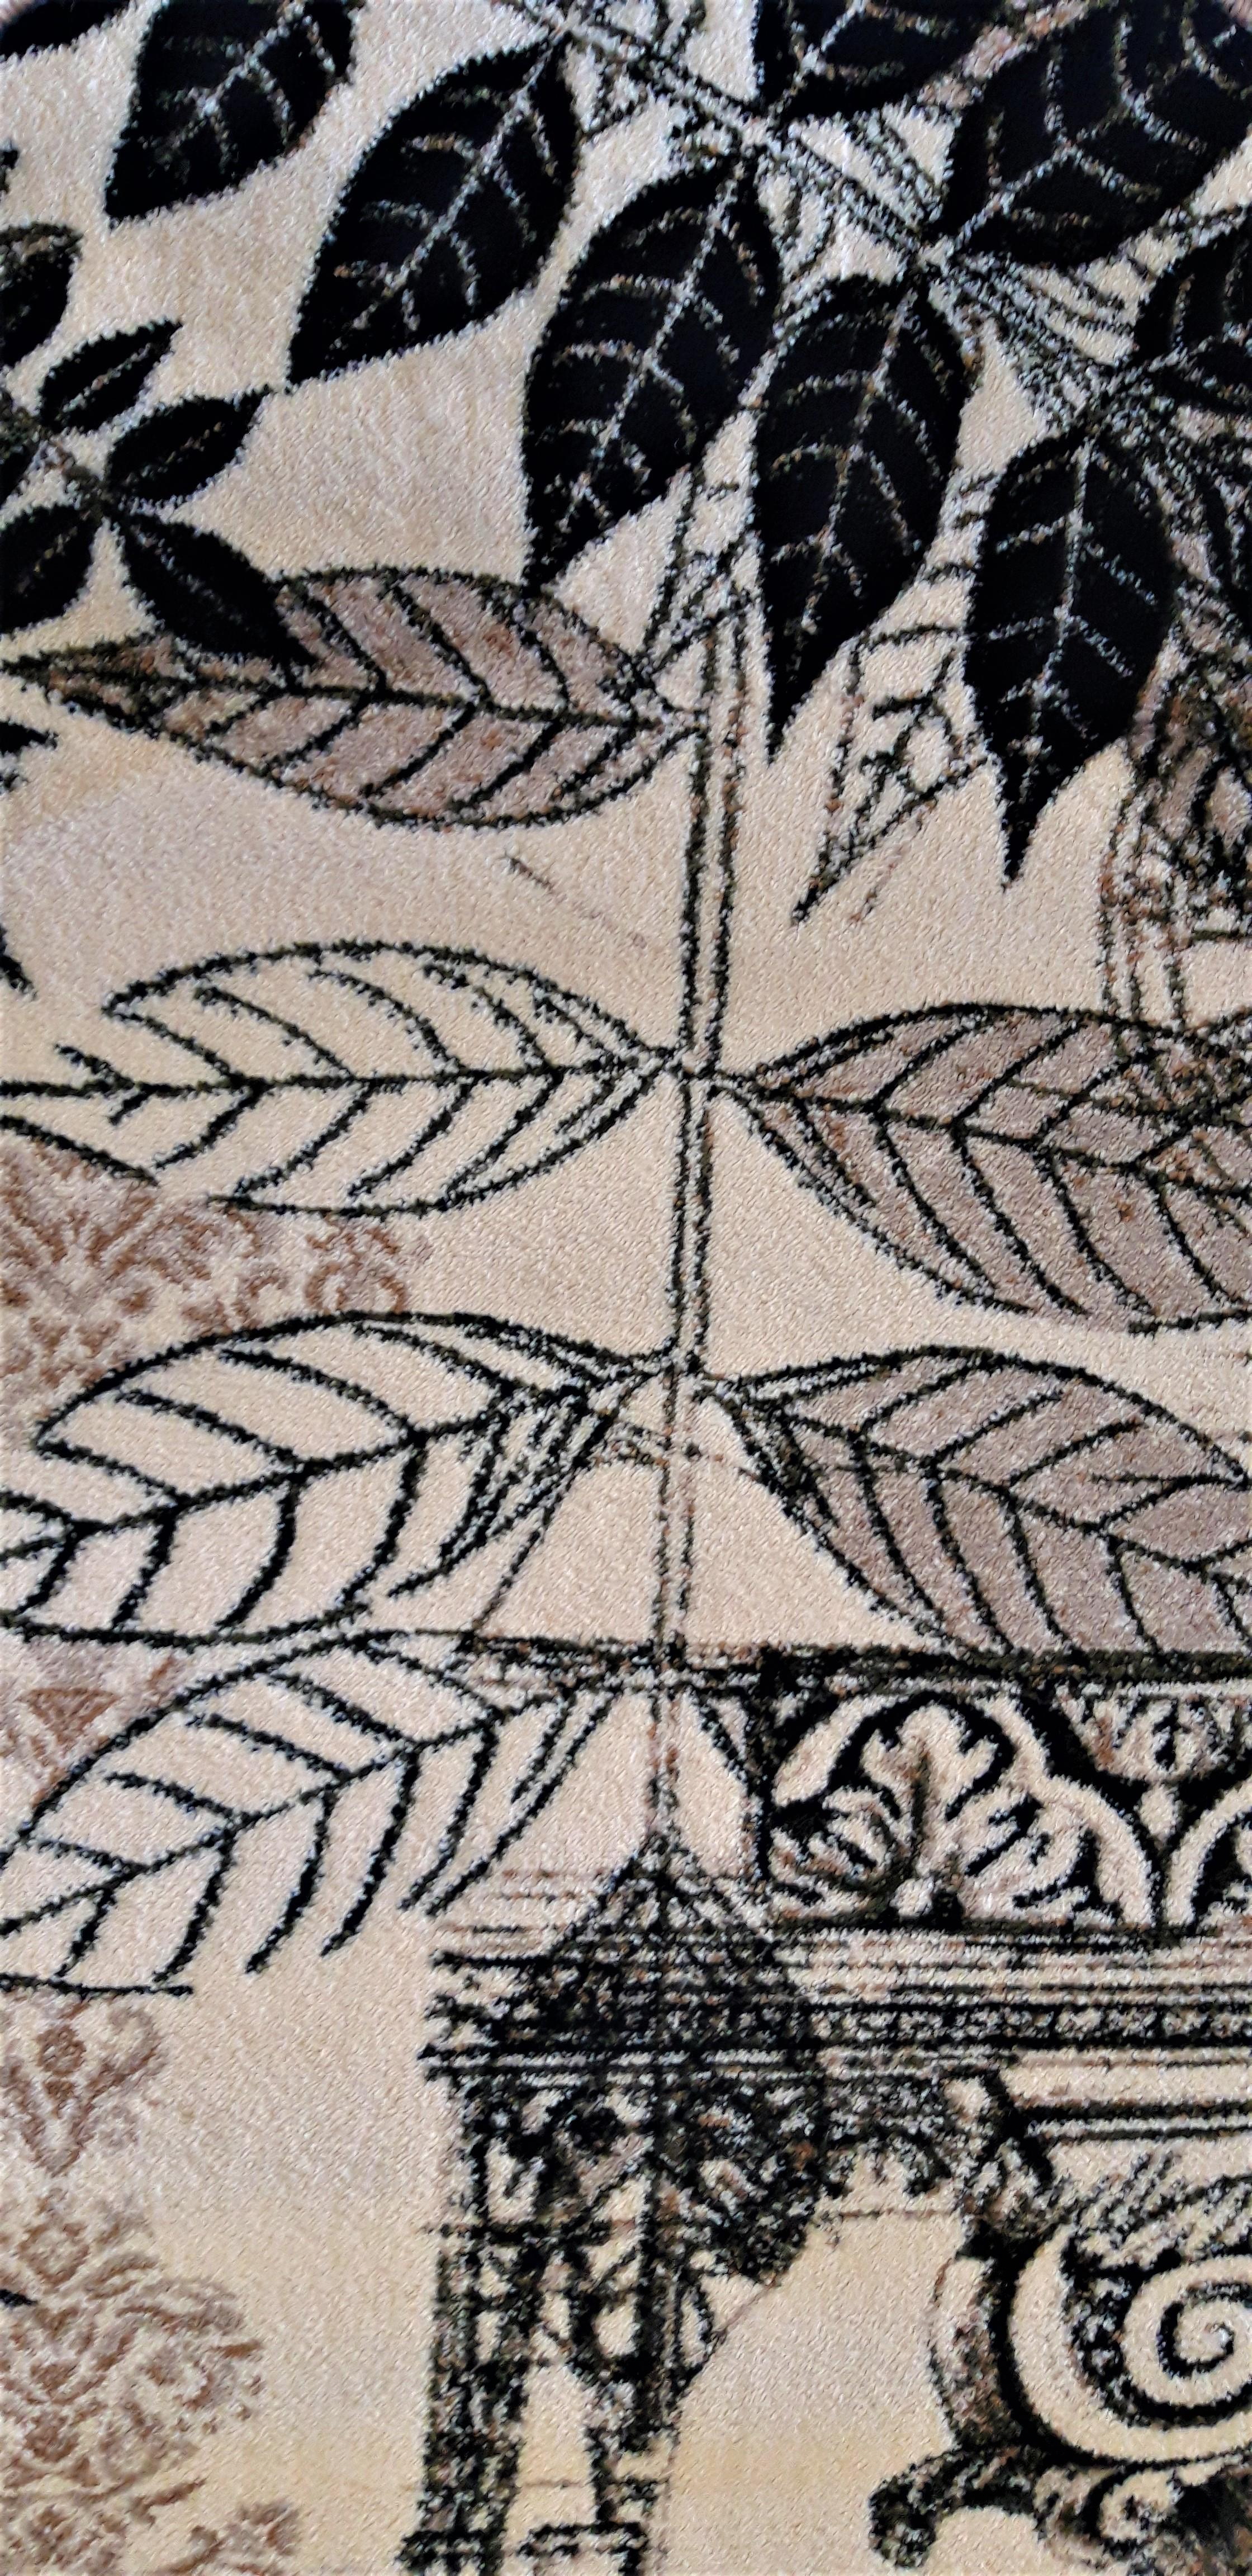 Covor Modern, Lotos Frunze 1545, Crem / Bej / Gri, Oval, 160x230 cm, 1800 gr/mp [4]